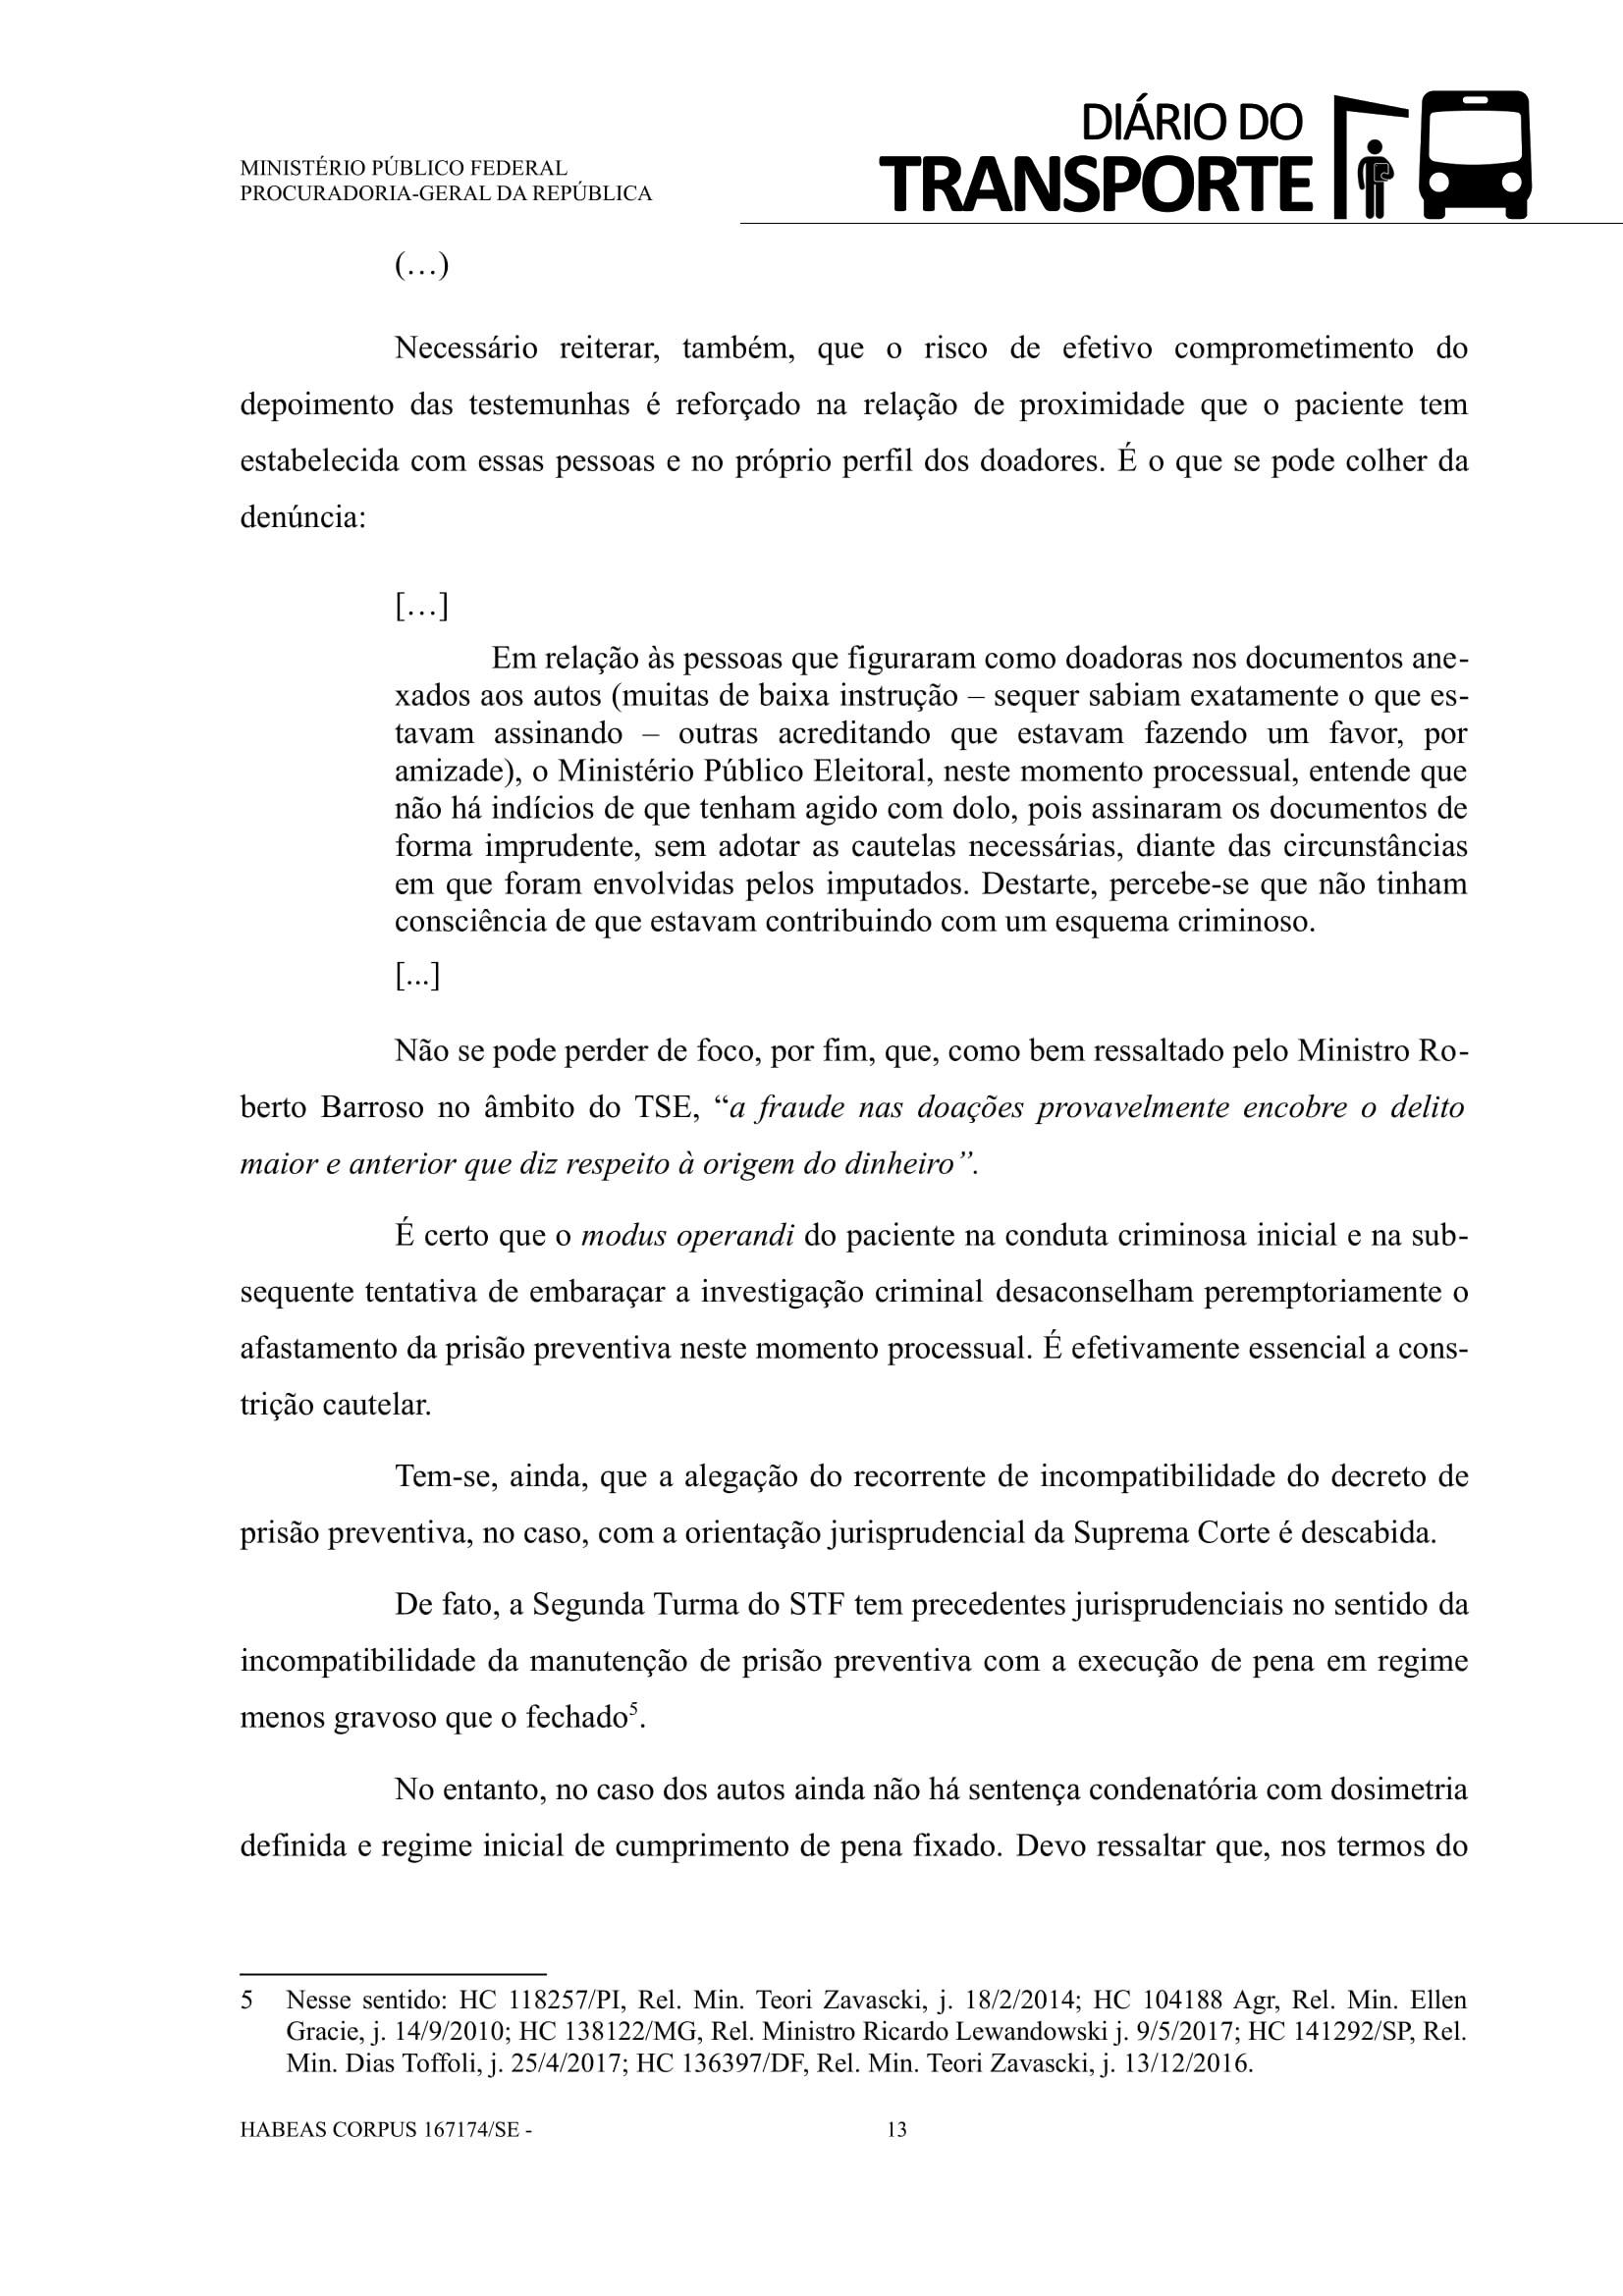 HC 167174_ContrarrazoesAgravo_Jose Valdevan de Jesus Santos-13